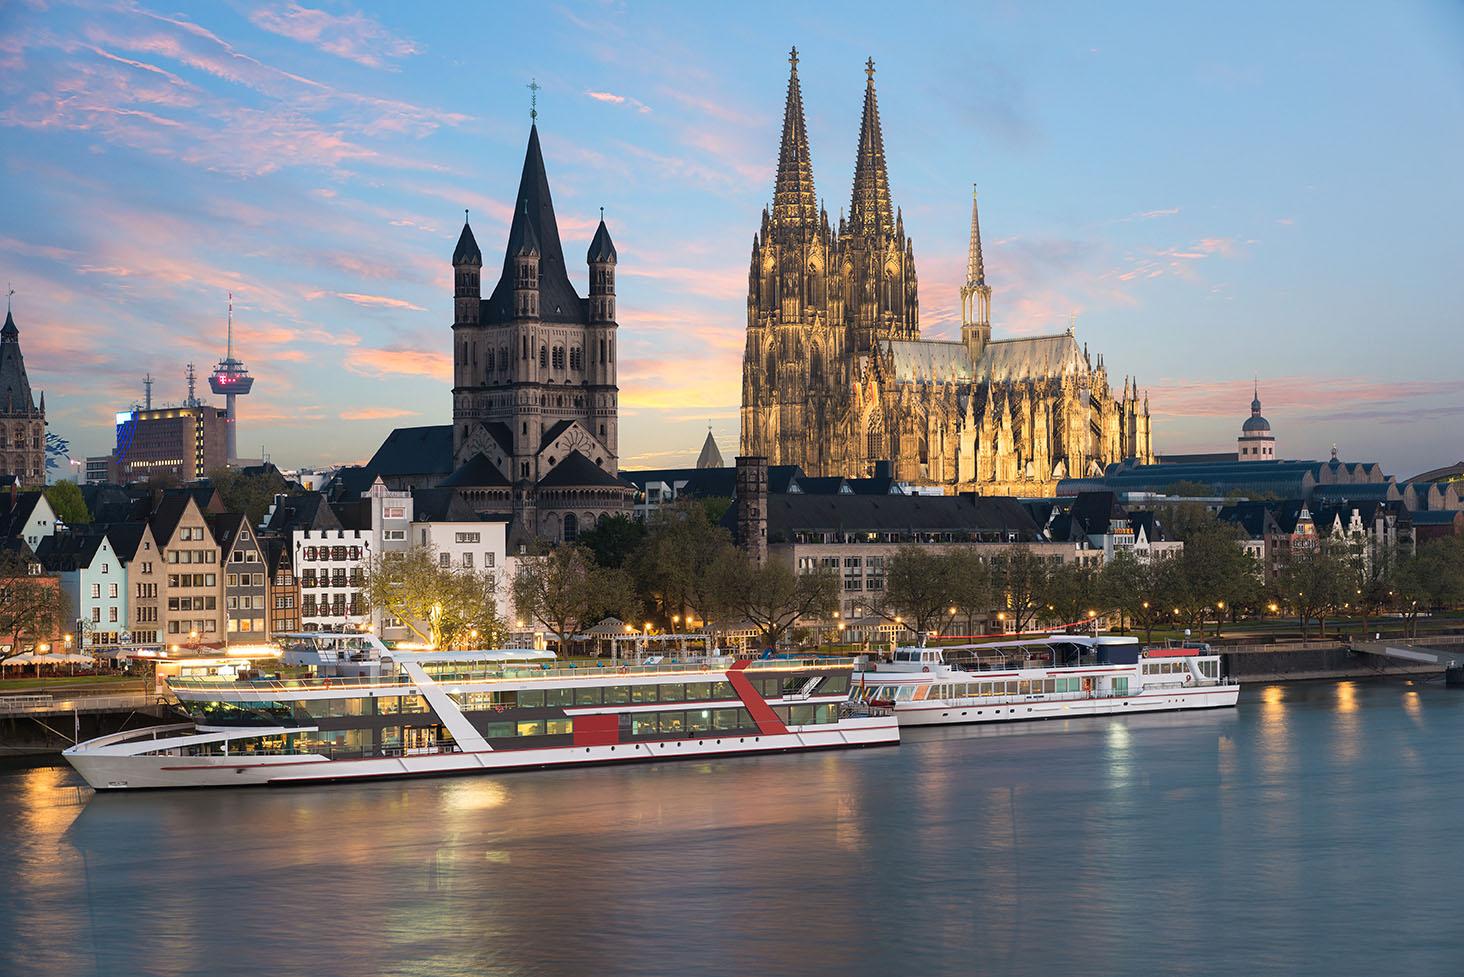 Rhine river cruise at night_sm.jpg